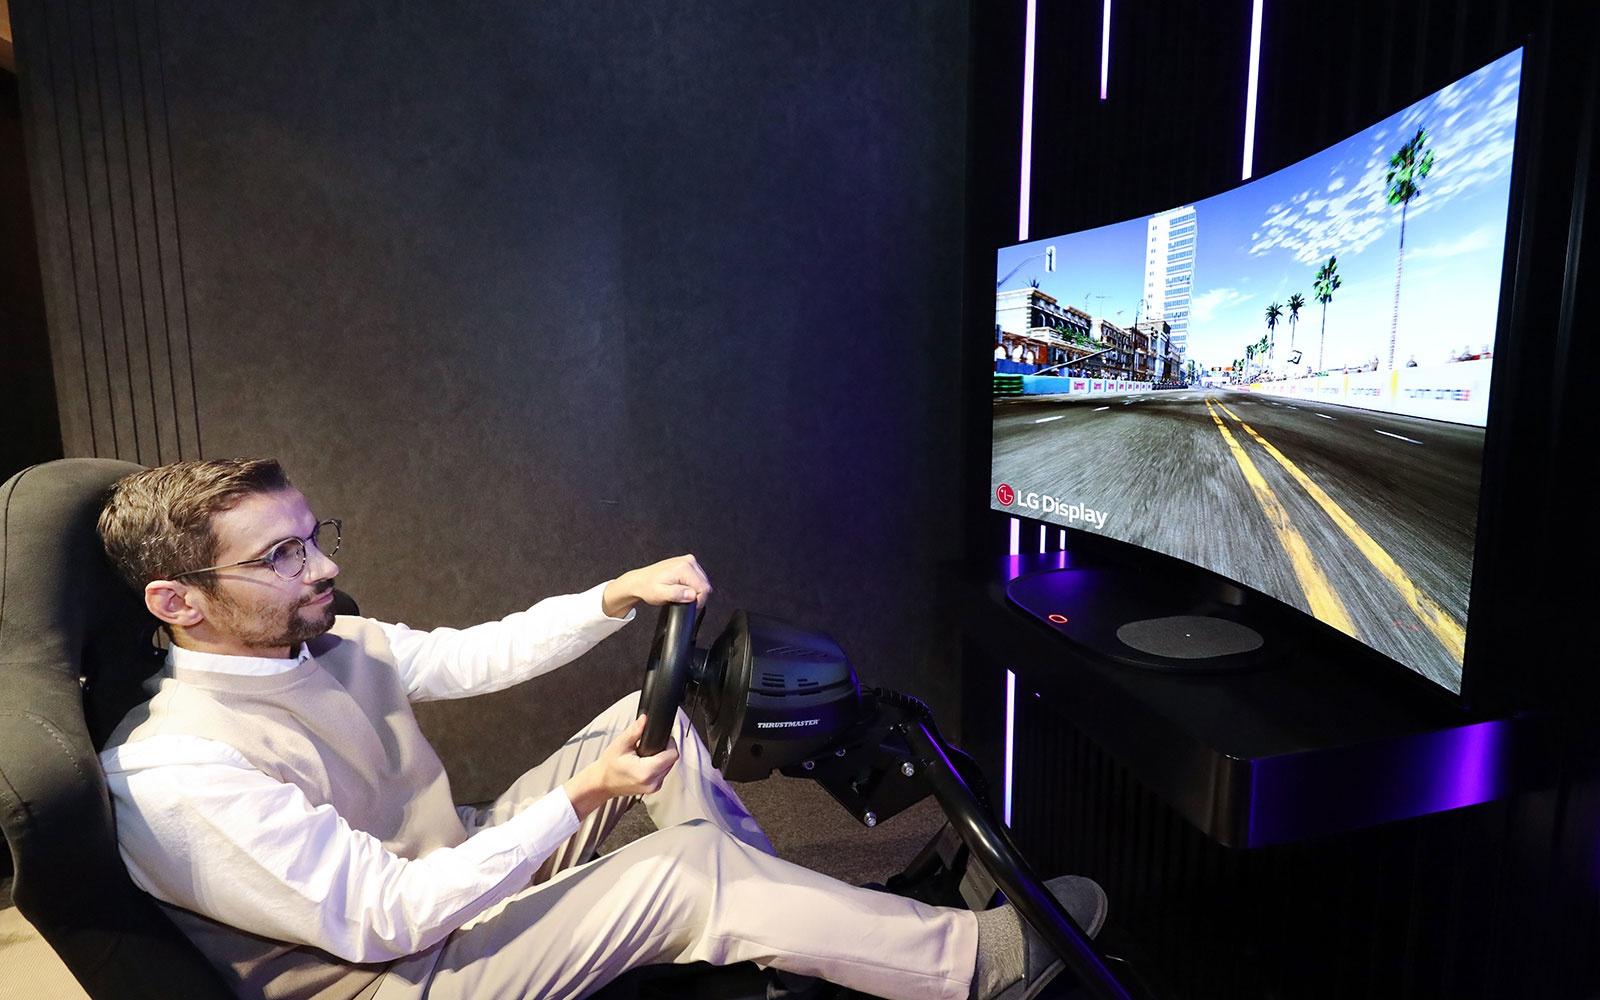 LG 将在CES 2021上展示一款可变身曲面屏OLED游戏显示器